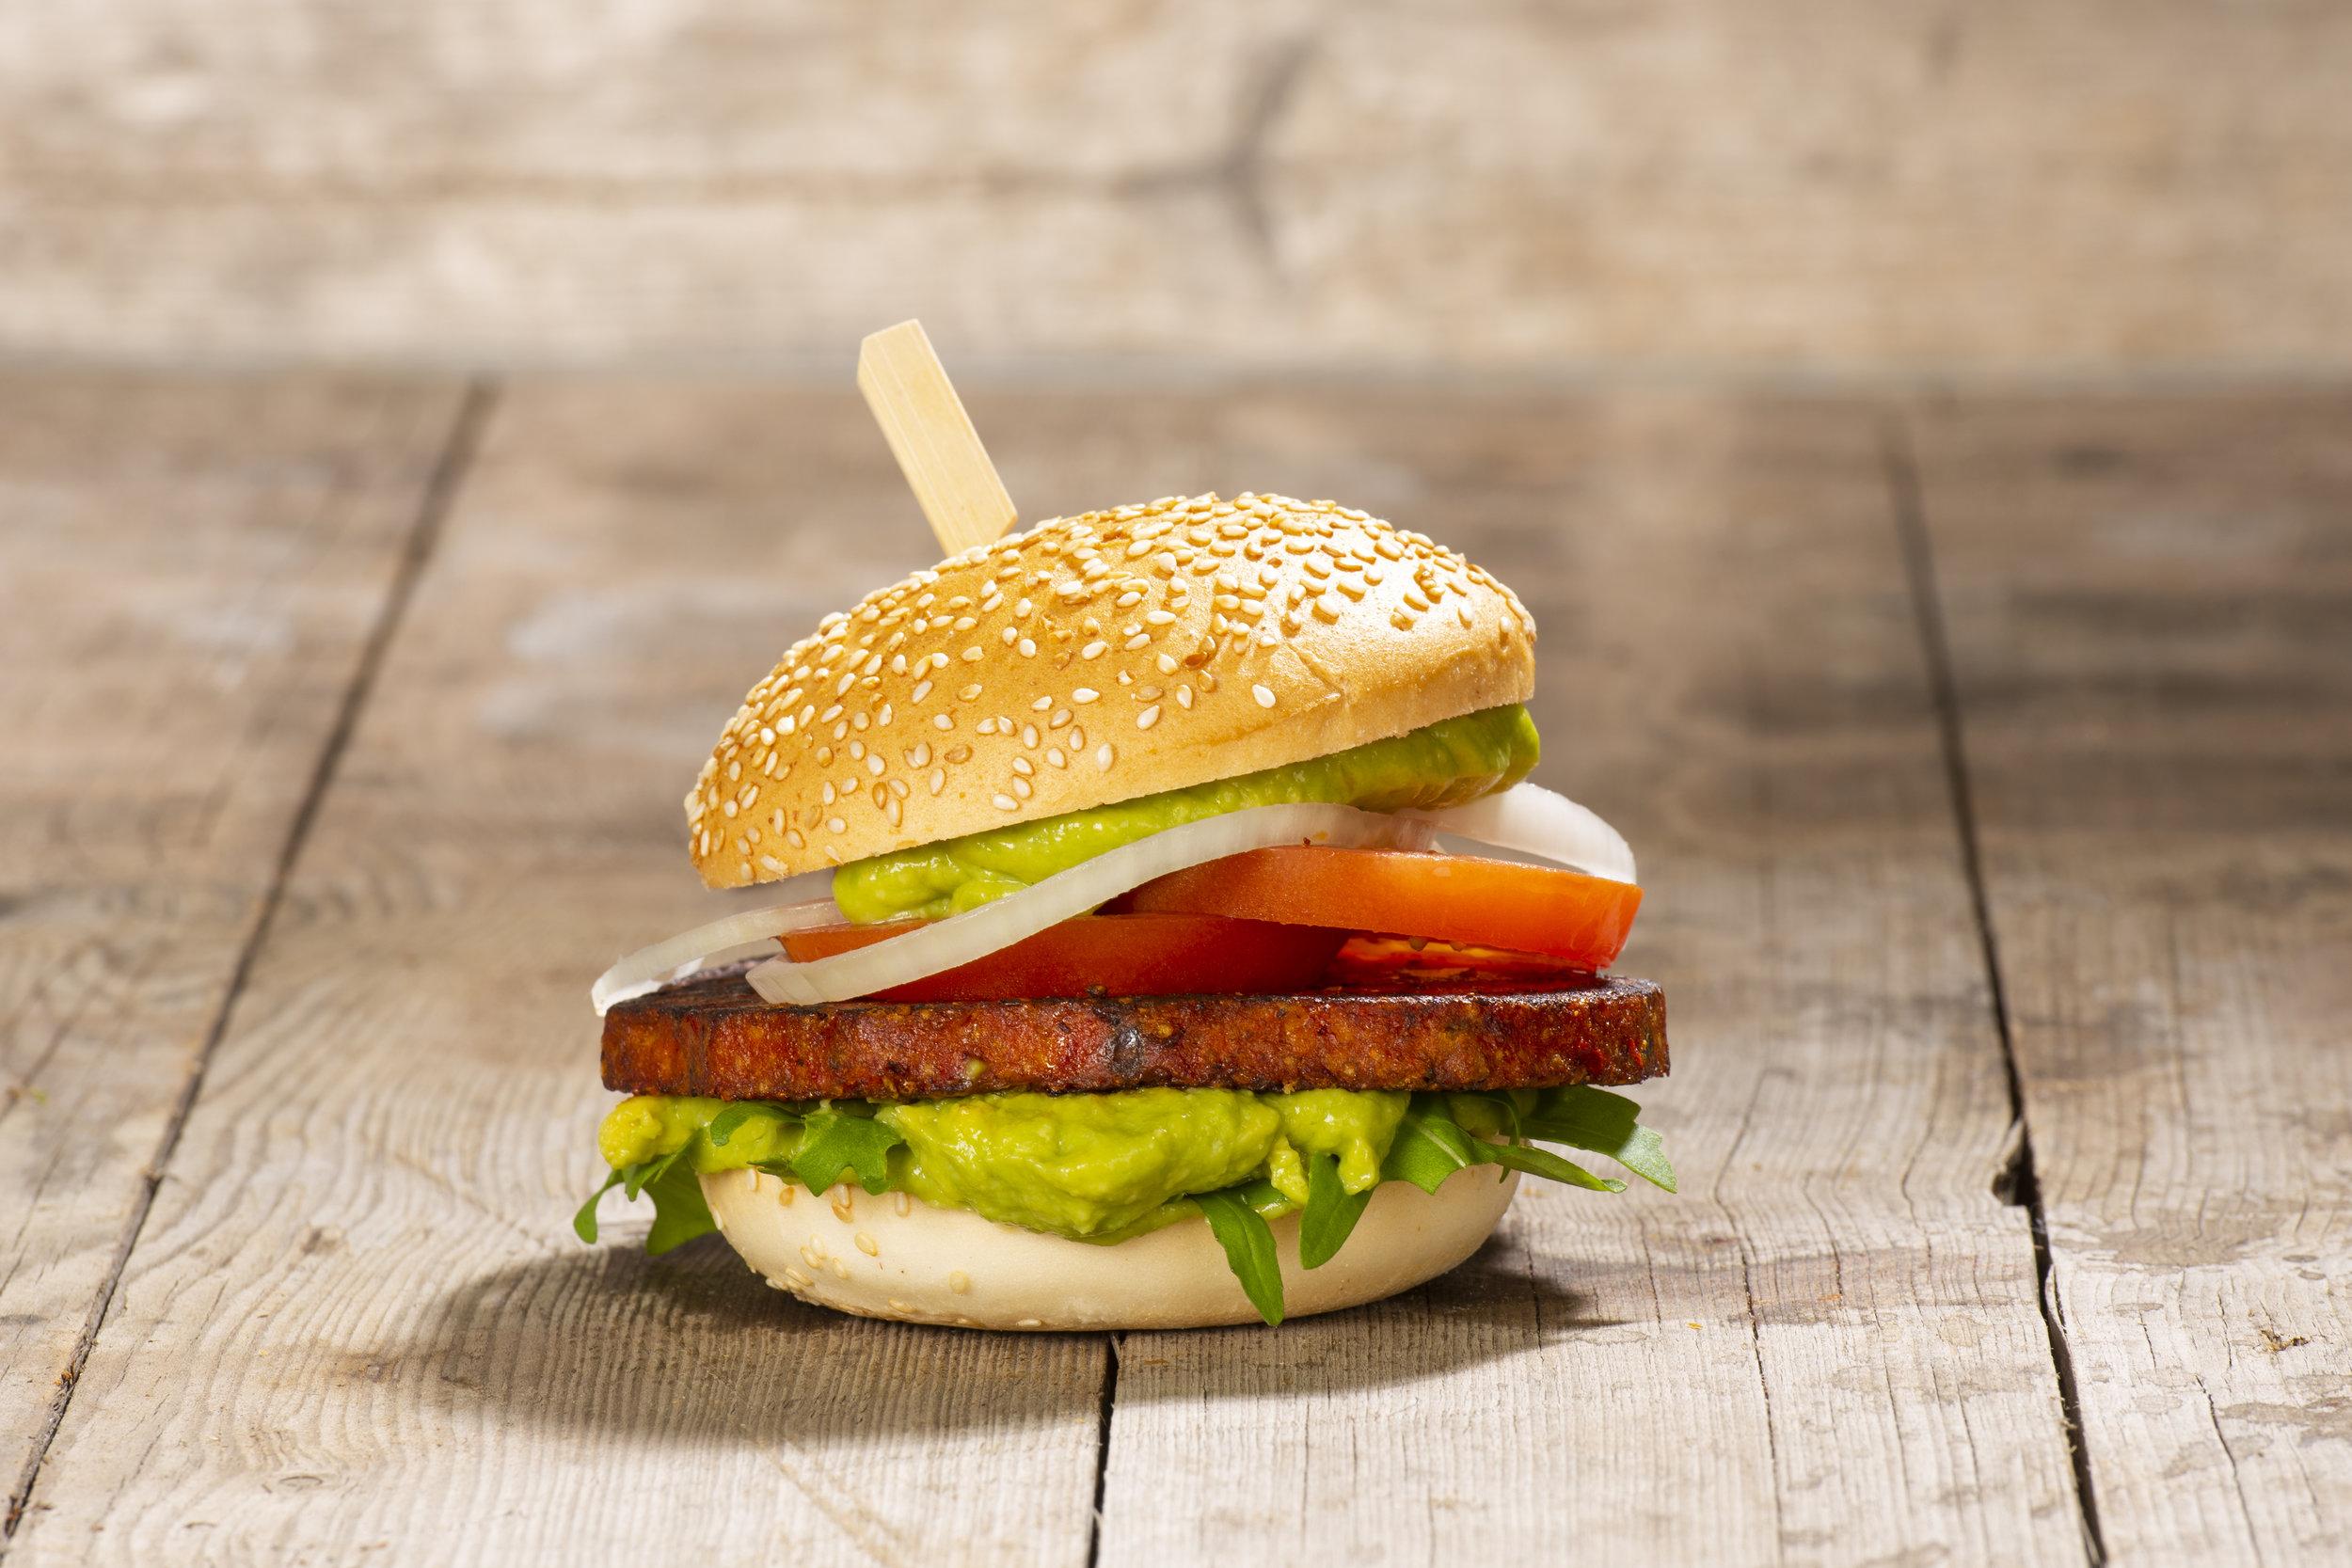 Veganer Burger - Chilli Quinoa Patty, Tomate, Avocadocreme, Rucola, Zwiebeln